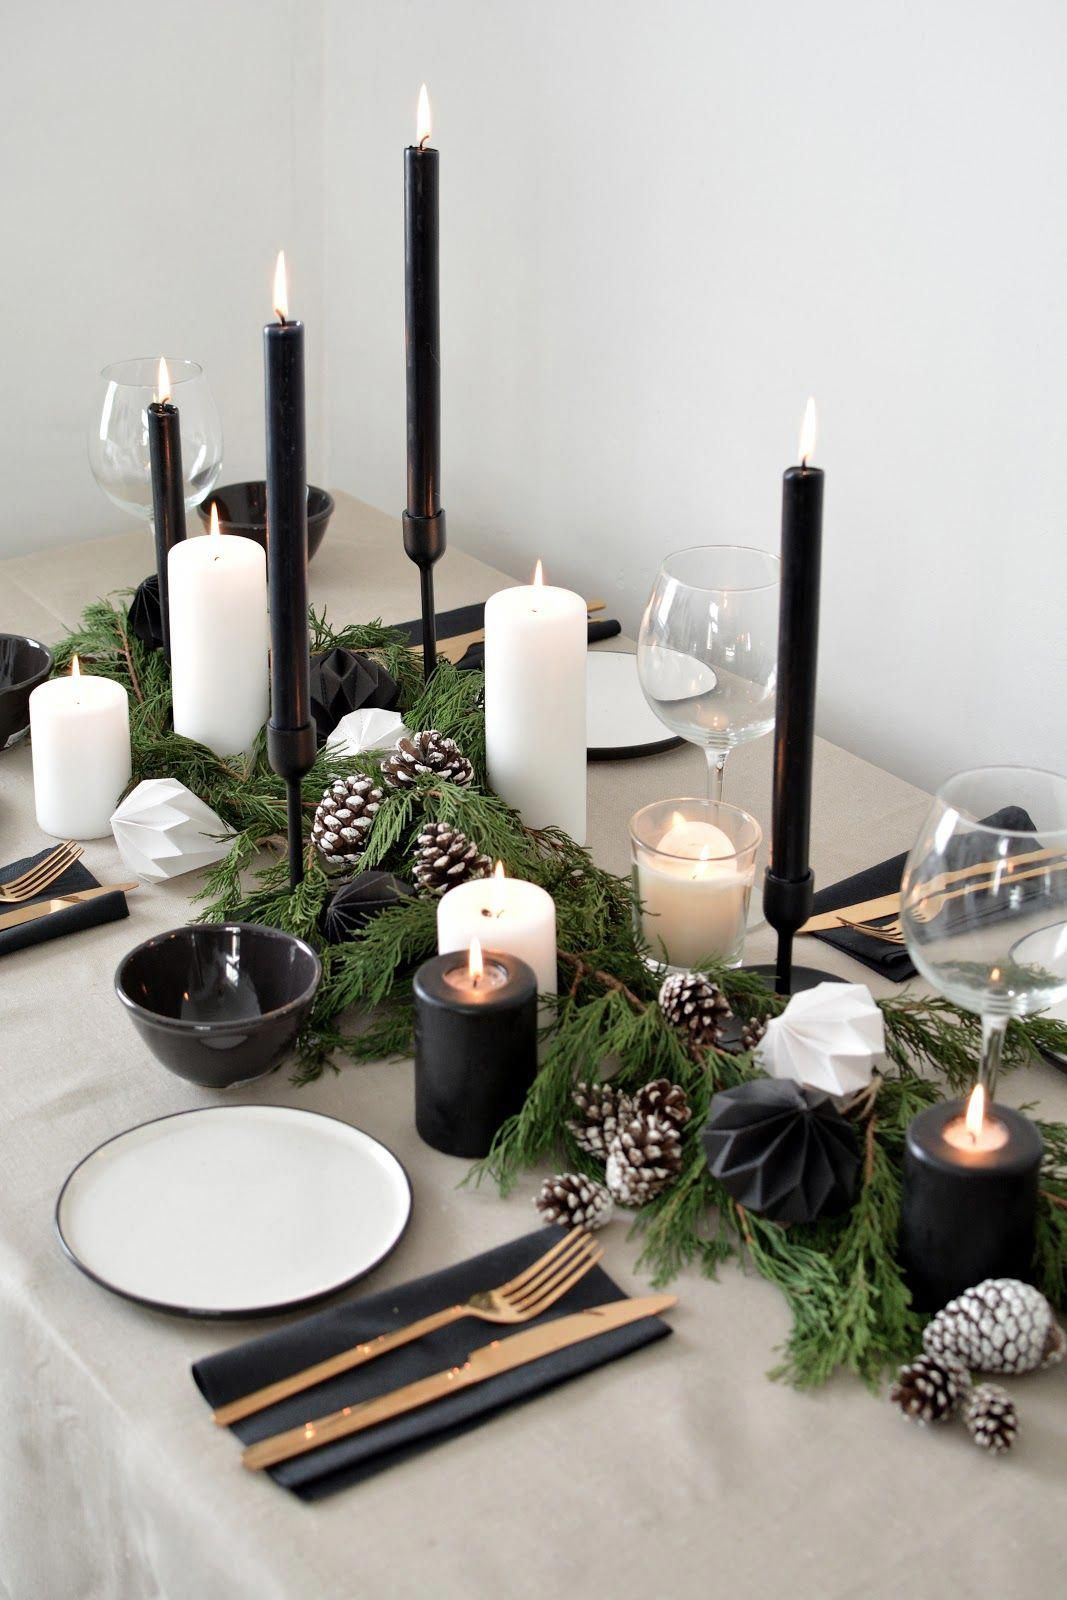 Nordic Christmas Decorations Diy Swedish Christmas Decorations Online Holiday Table Decorations Christmas Table Centerpieces Scandinavian Christmas Decorations